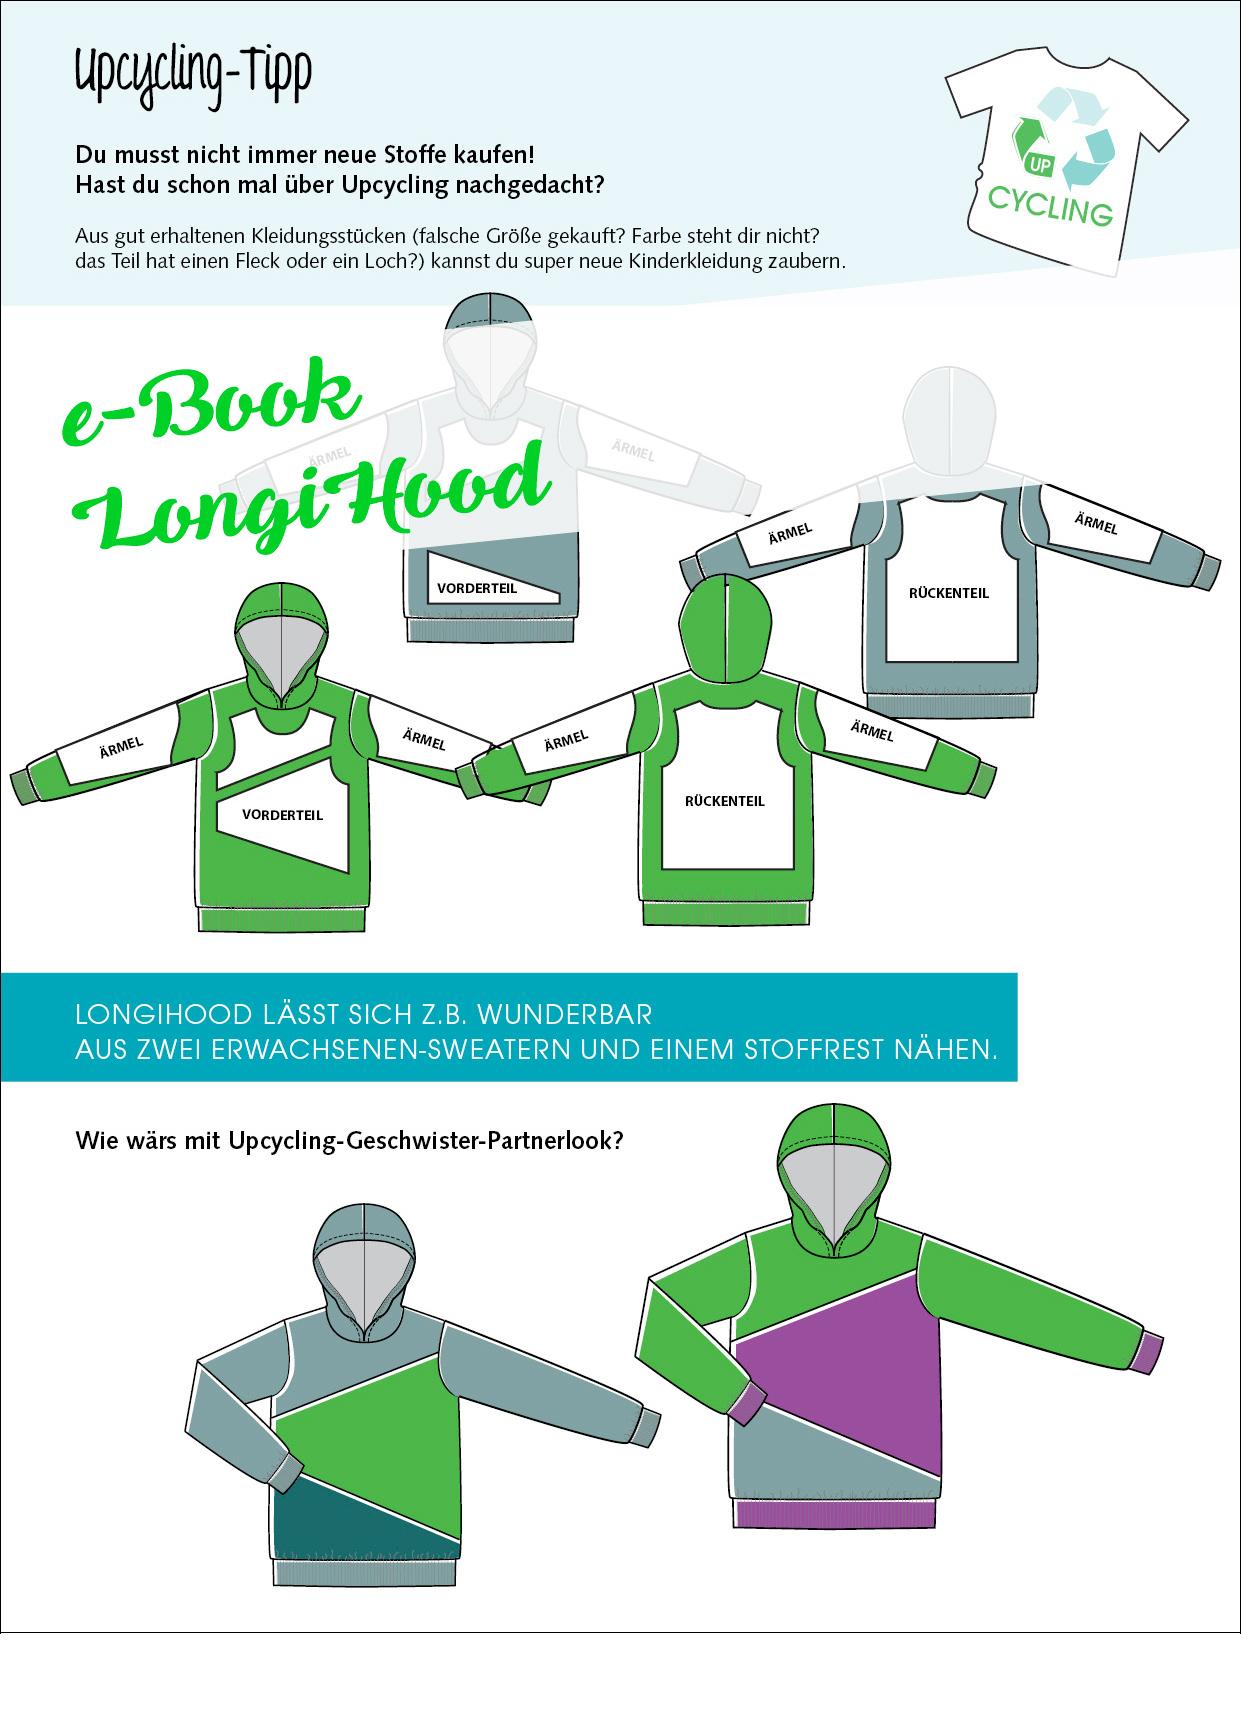 Upcyclingtipp für Hoodie: Kinder-Sweater LongiHood nähen